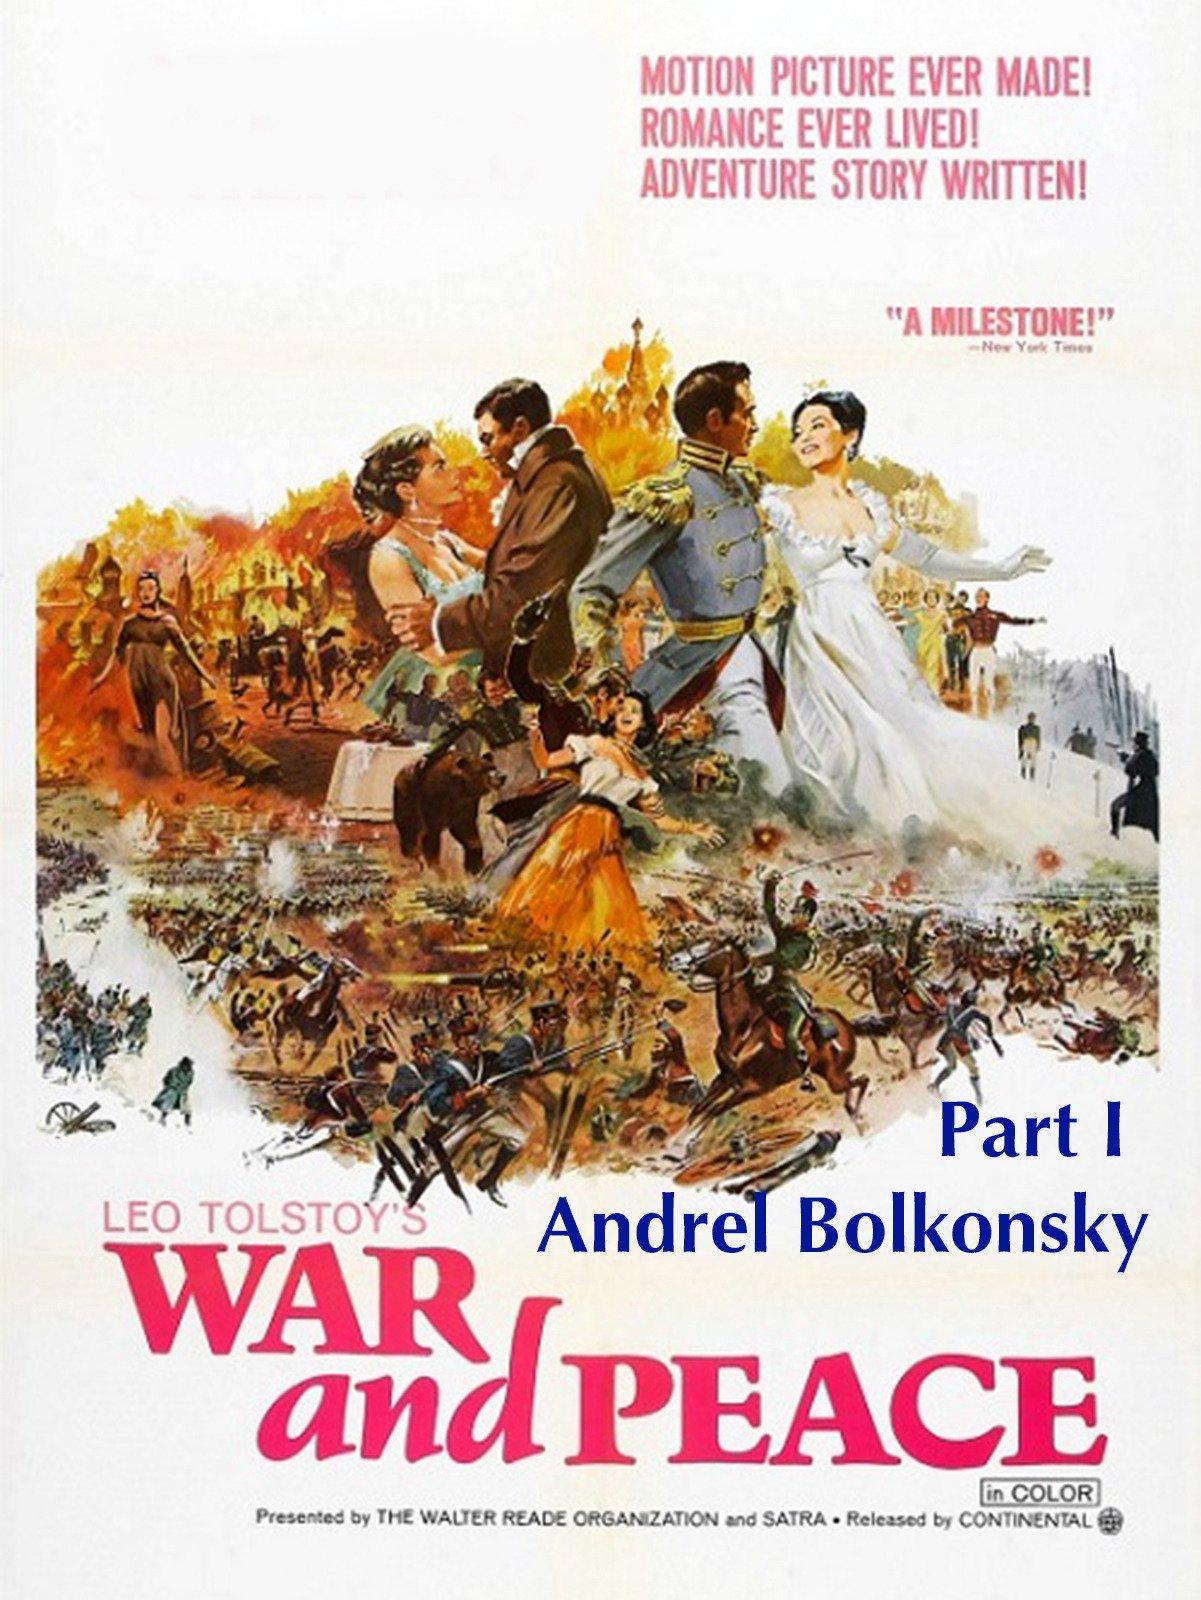 War and Peace: Part I Andrel Bolkonsky